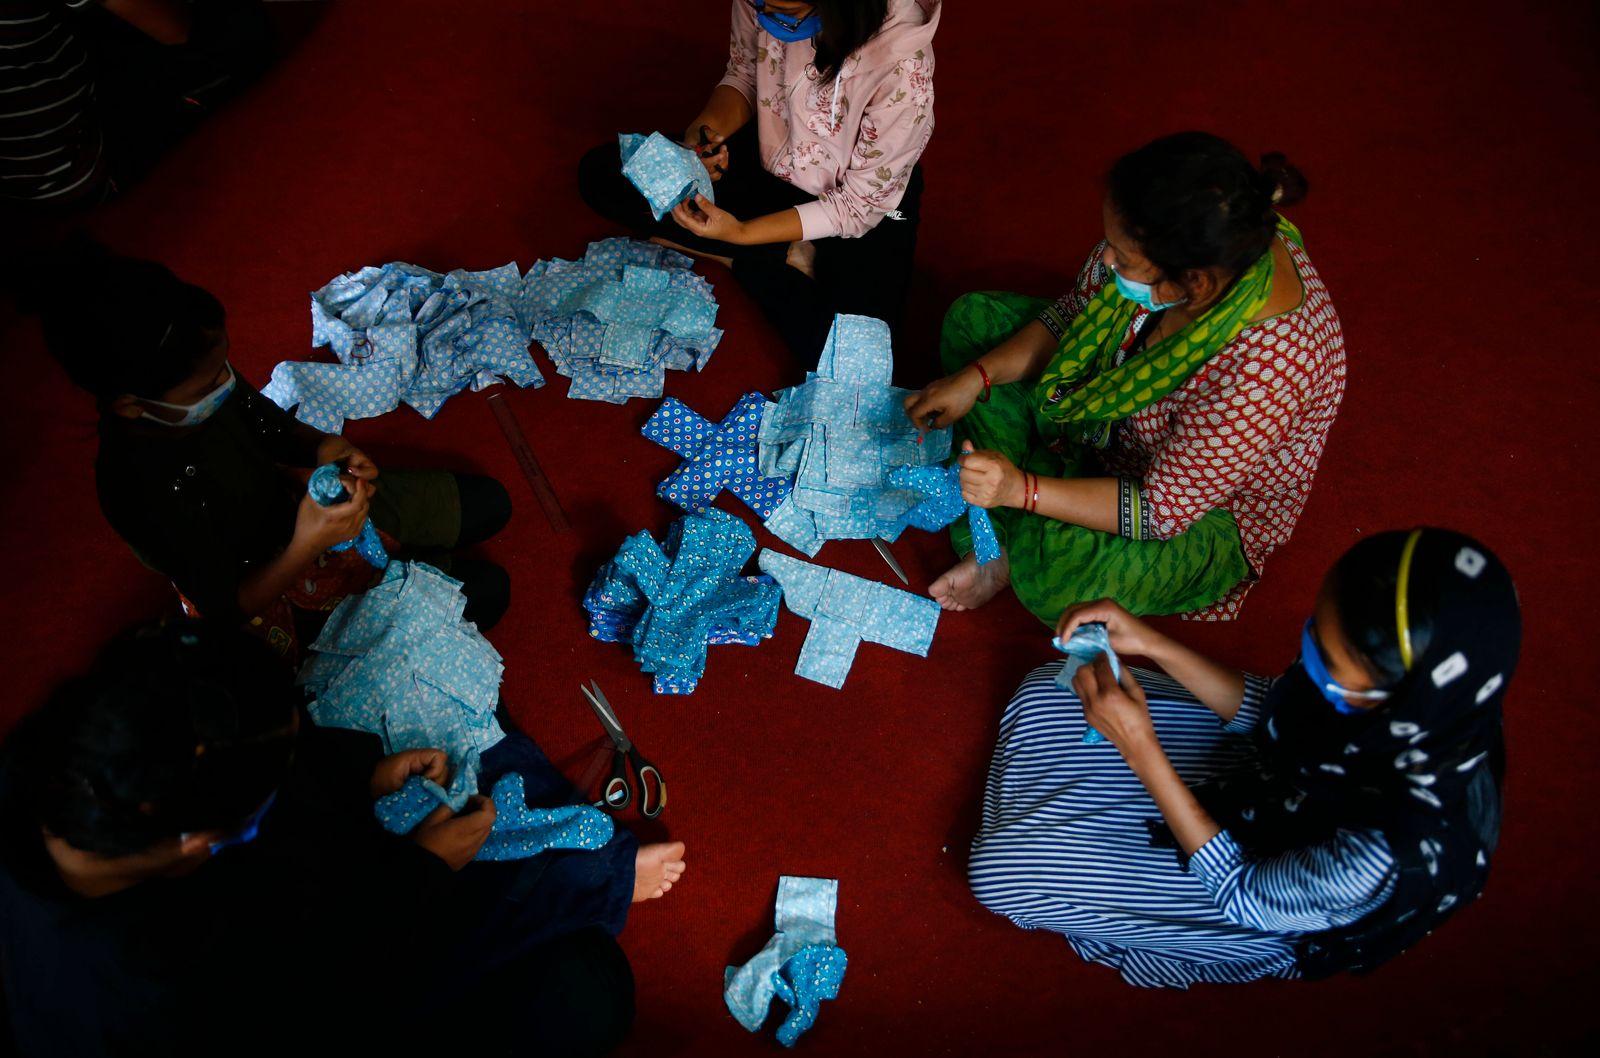 June 6, 2020, Kathmandu, Nepal: Volunteers of Mirmirey Youth Society make reusable sanitary pads at Sinamangal in Kathma